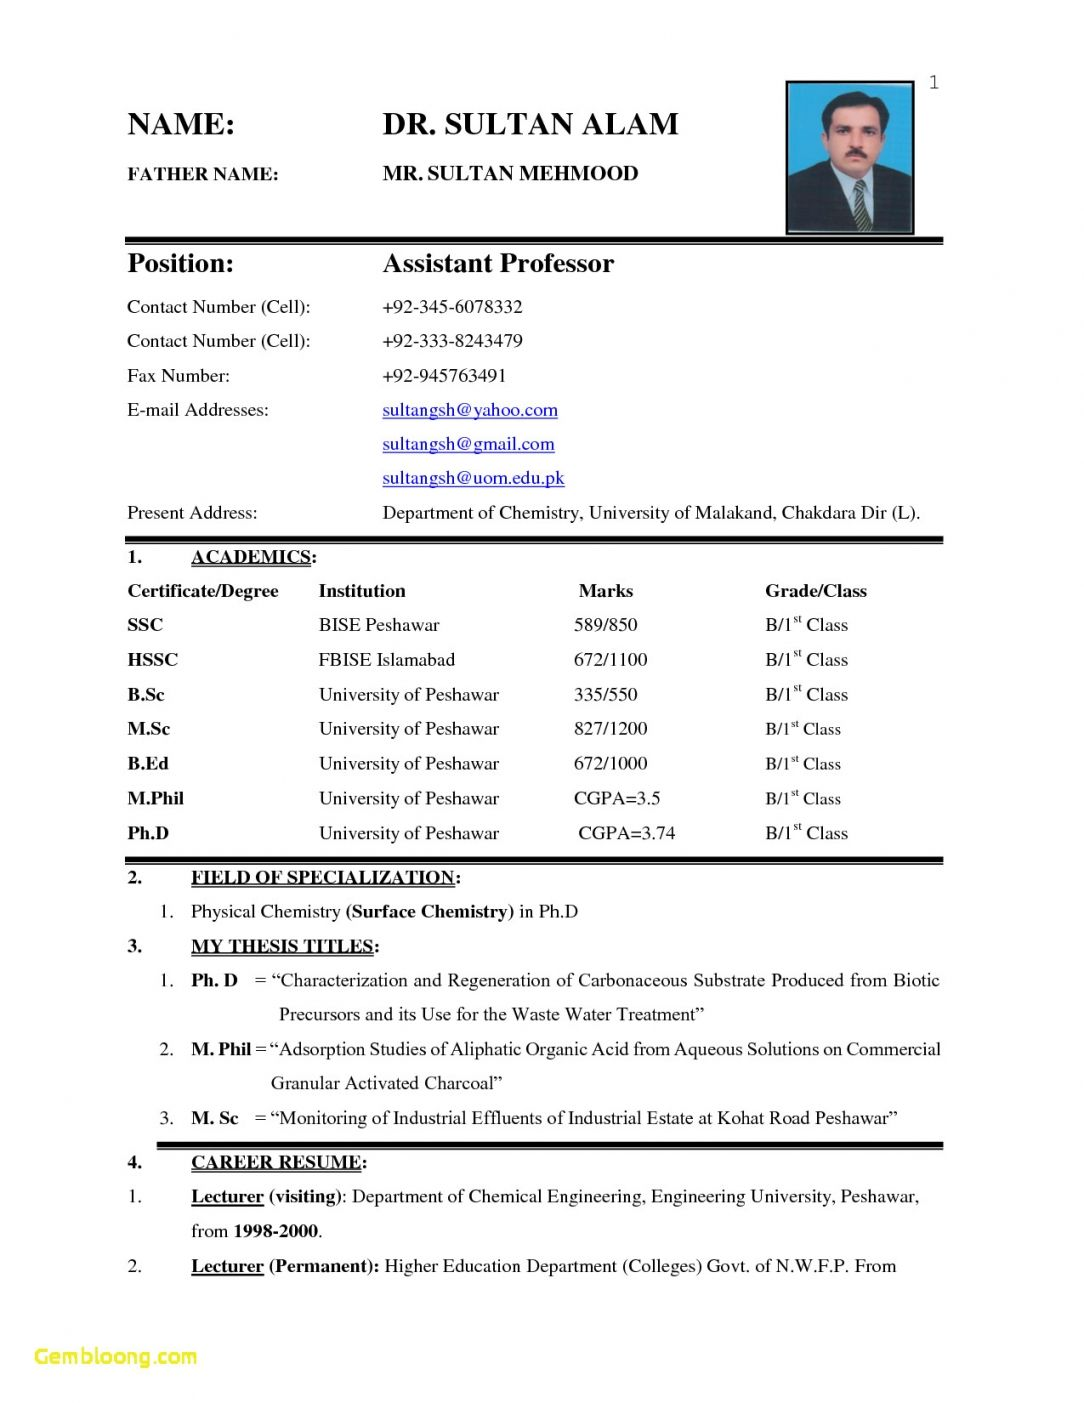 M Phil Resume Format Resume Format Biodata Format Biodata